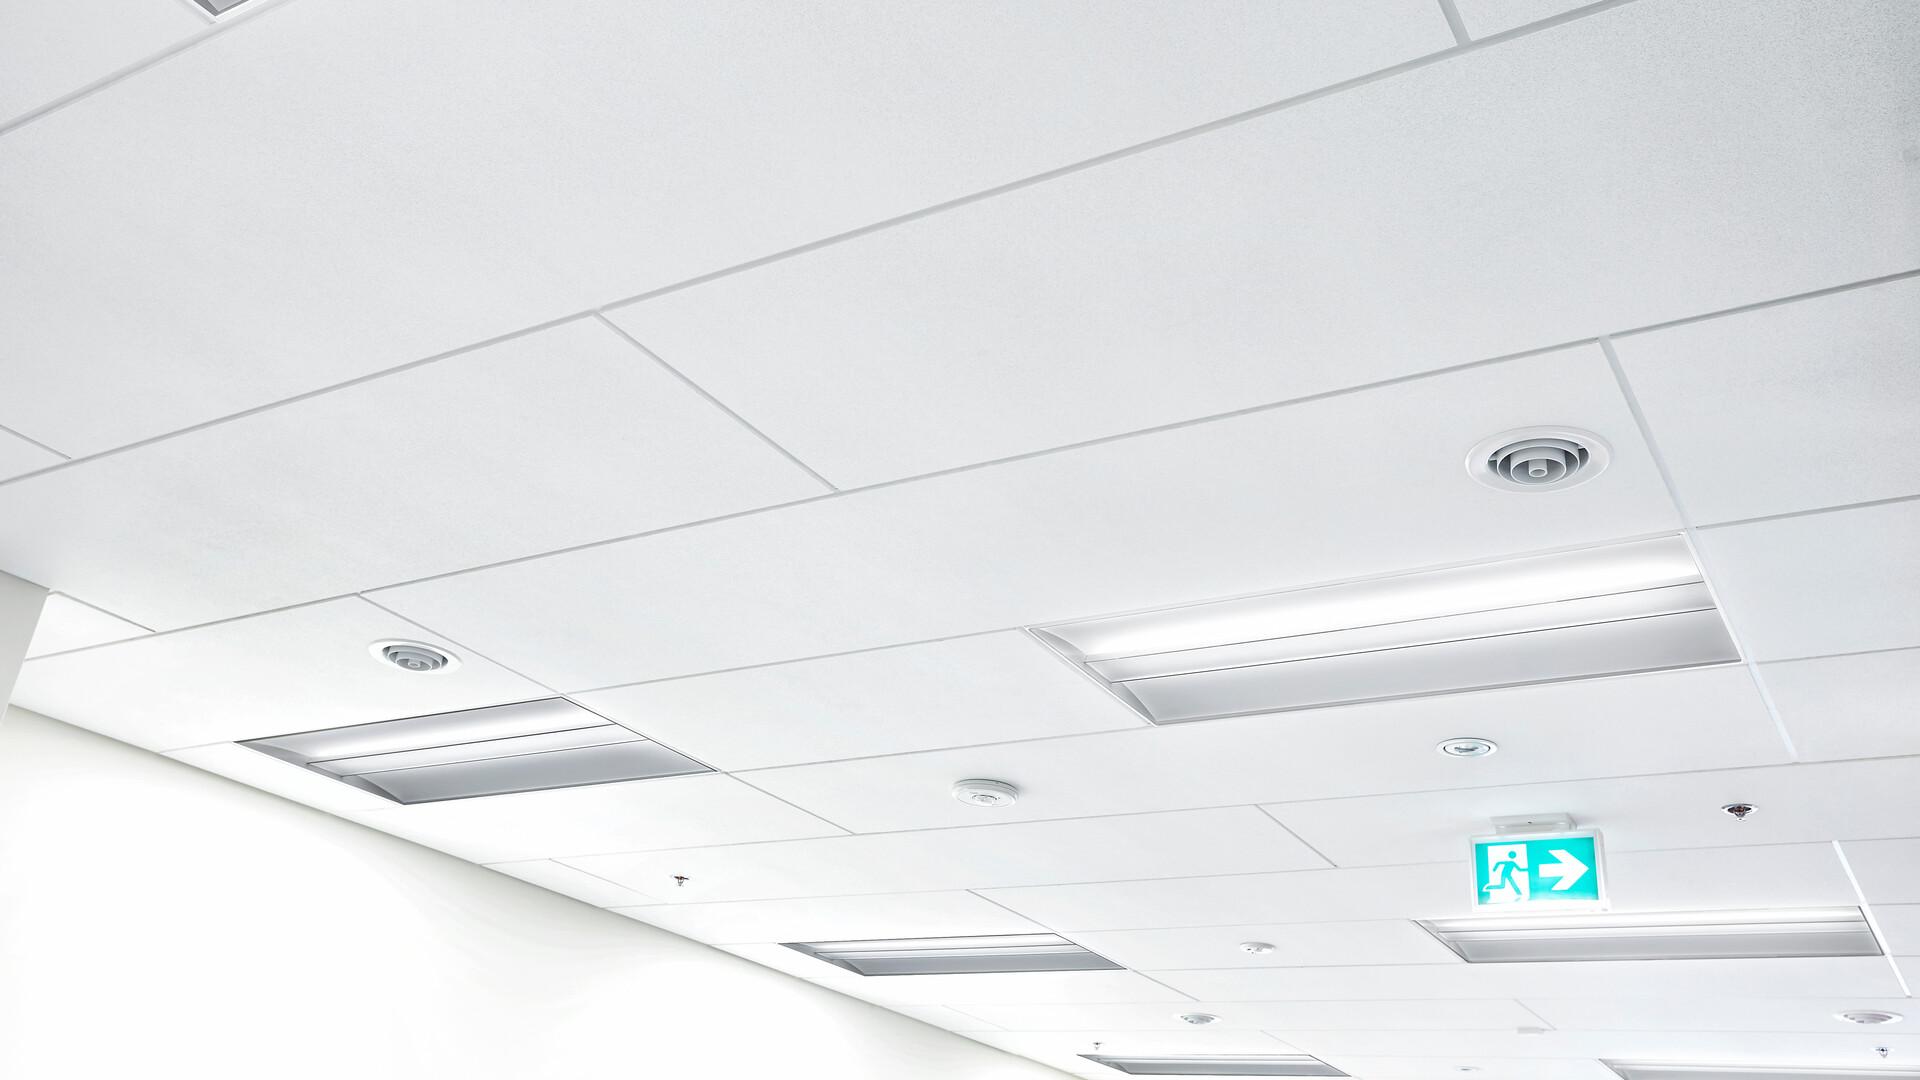 "Featured products: Rockfon Sonar® - Rockfon Alaska® - Rockfon® Color-all™ - Rockfon® Island™ - Rockfon® Cubegrid® Open Plenum 15/16"" Ceiling - Rockfon® Infinity™ Z Perimeter Trim - Rockfon® Intaline™ V-Base Metal Baffle Ceilings - Rockfon® Planar® and Planar® Plus Linear Ceilings"